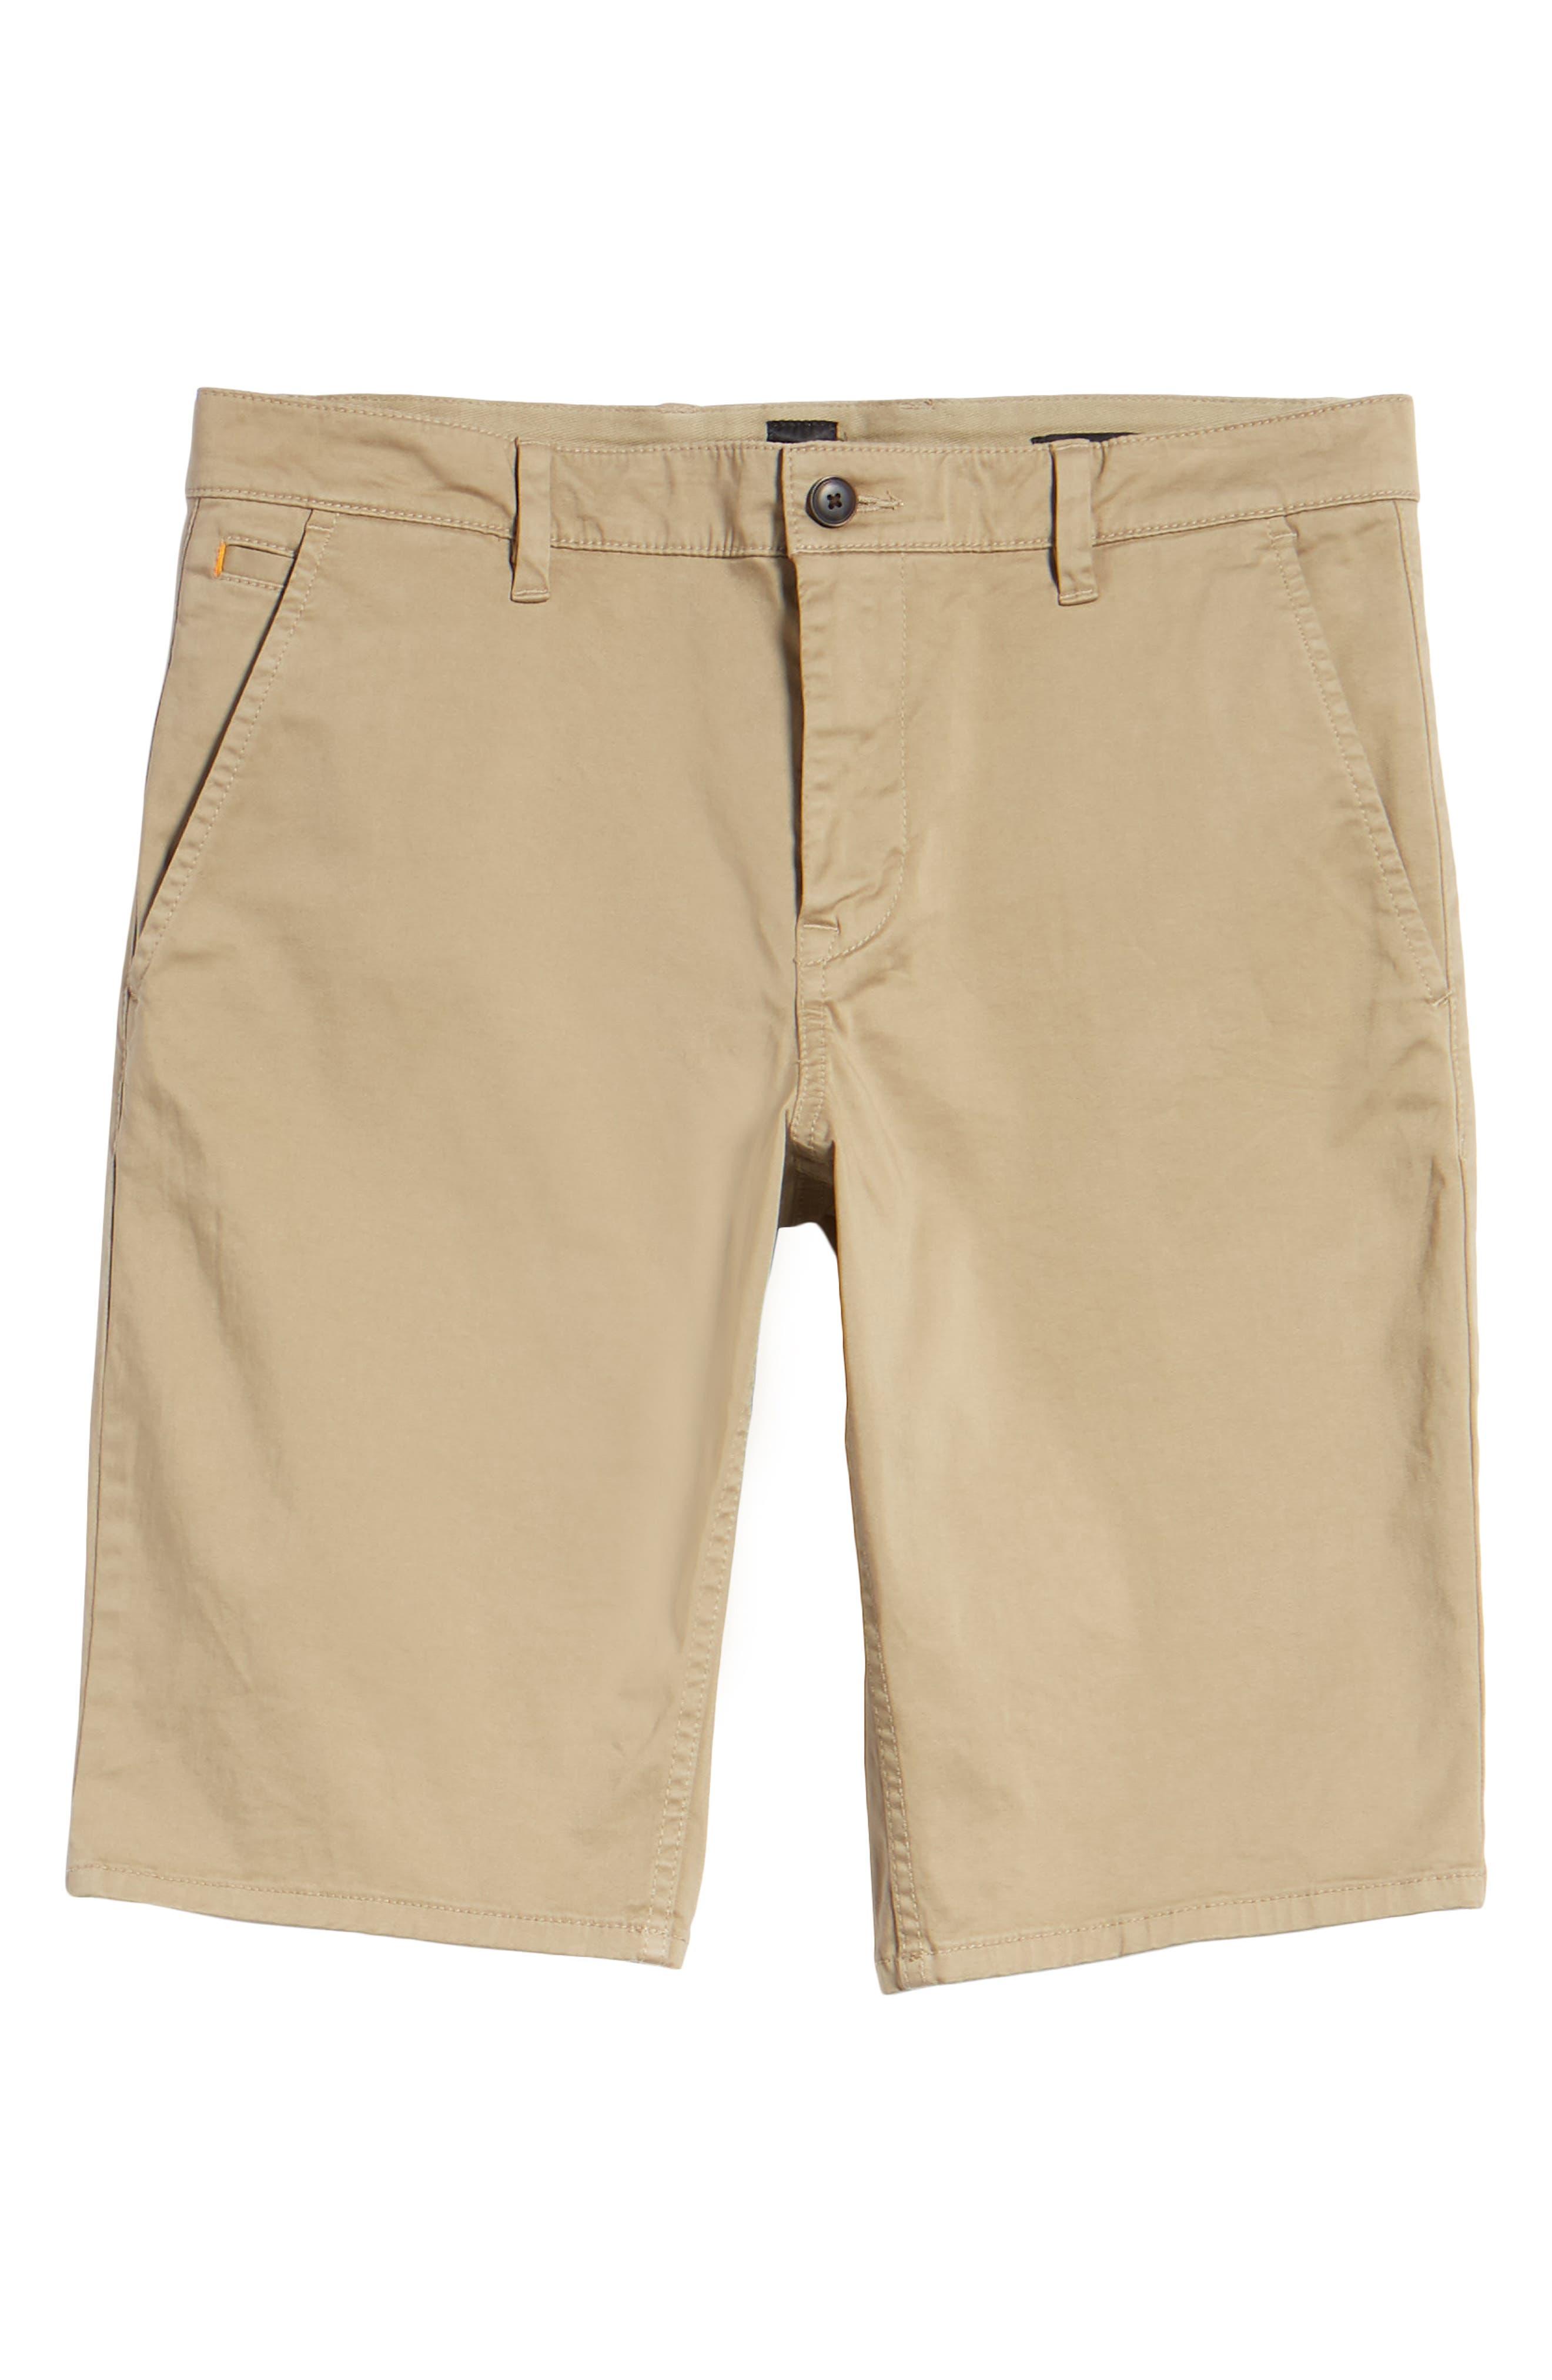 Slim Fit Shorts,                             Alternate thumbnail 6, color,                             200